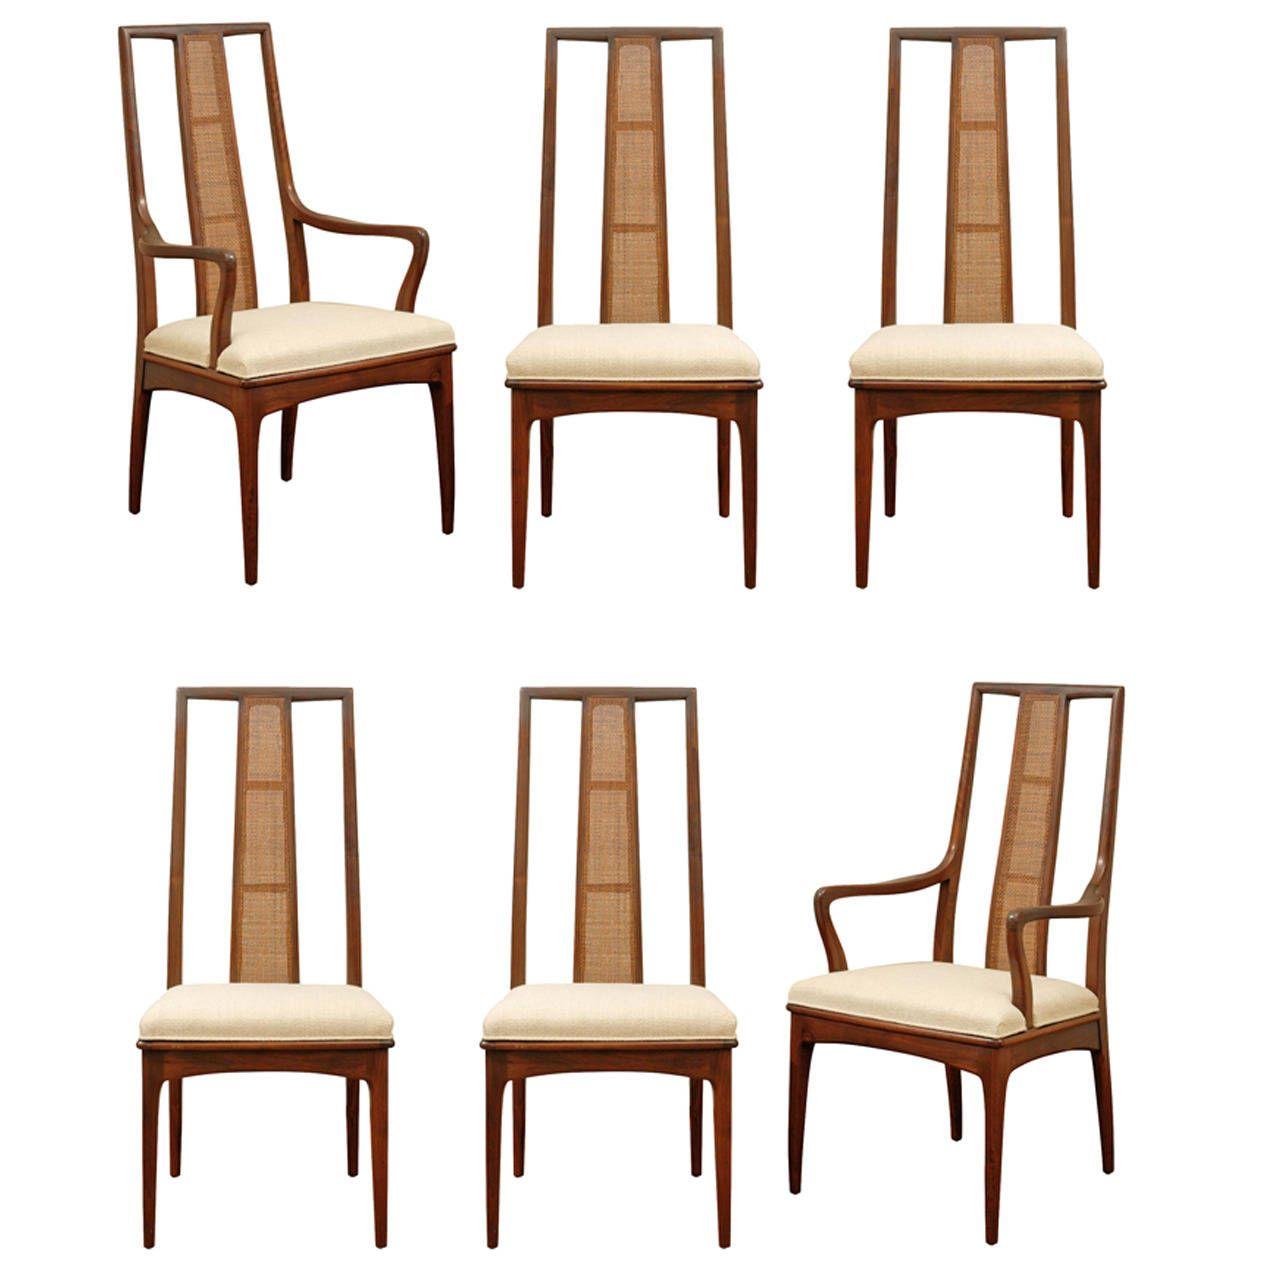 Elegant Set Of Six Walnut And Cane Dining Chairs By John Stuart